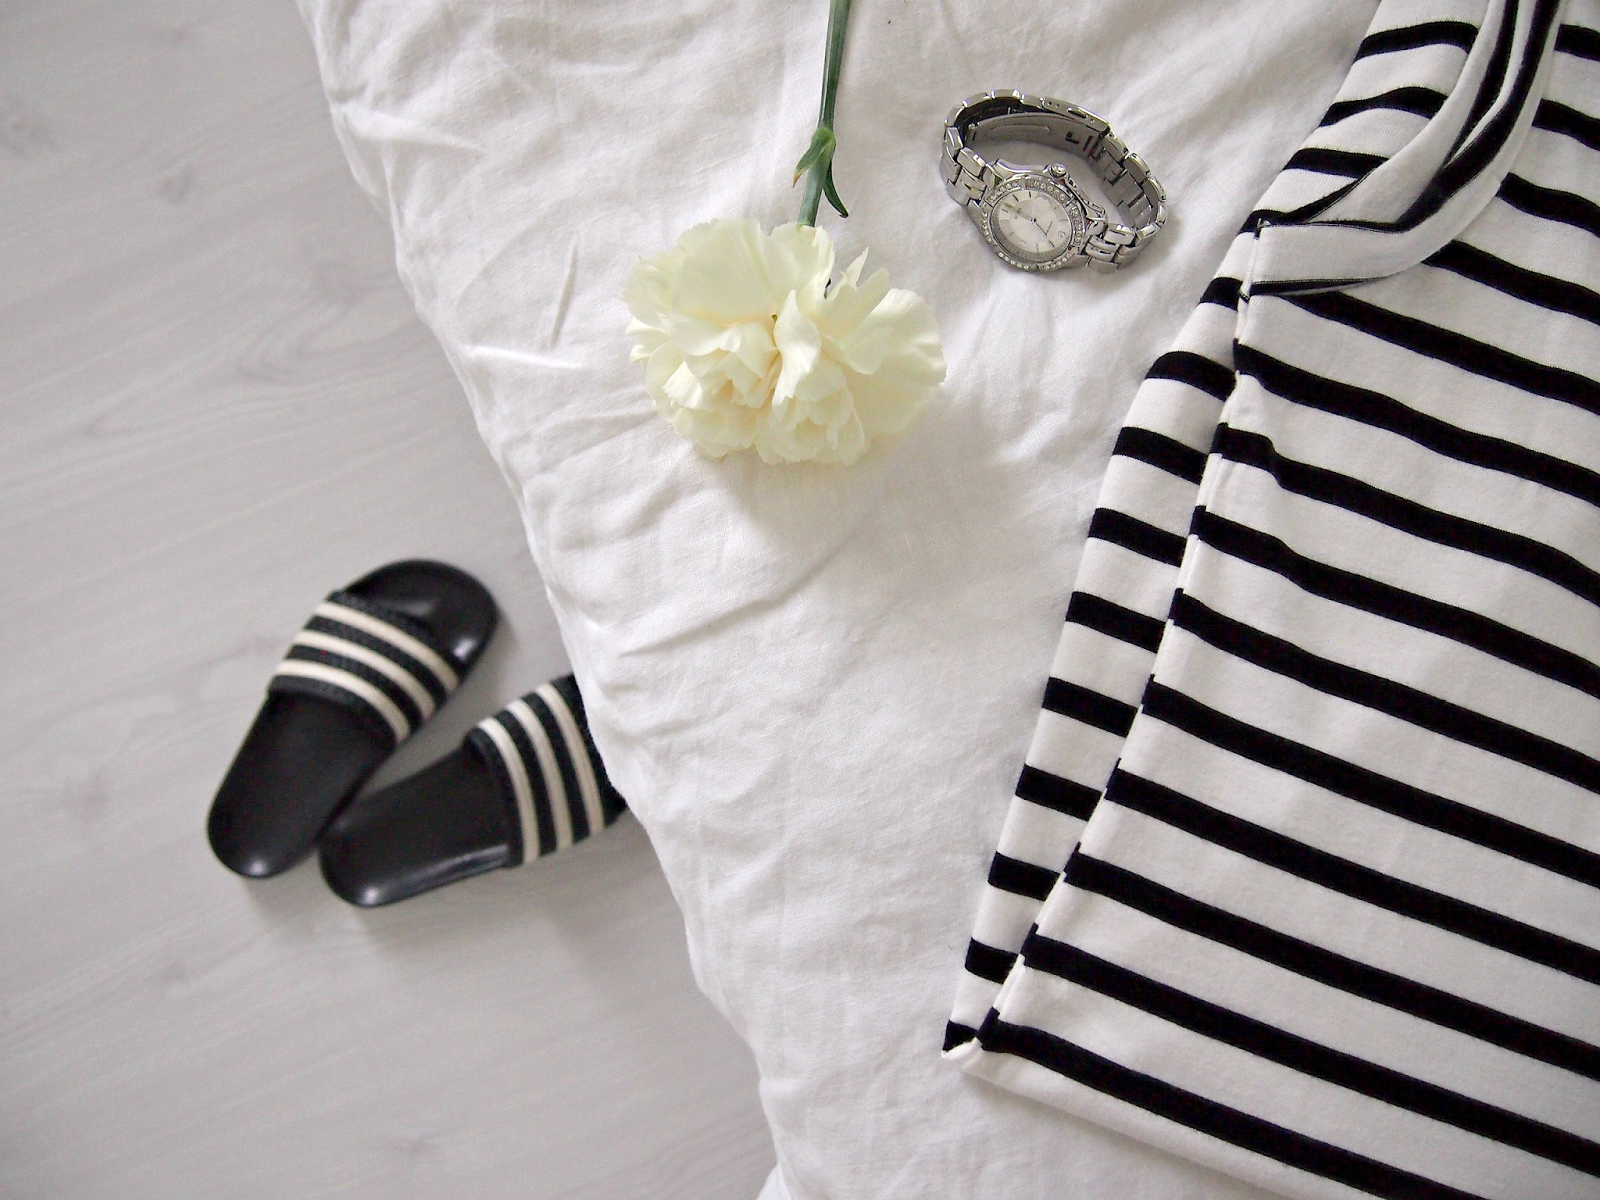 Hannas Home / summer favourites / Adidas sandals / Guess watch